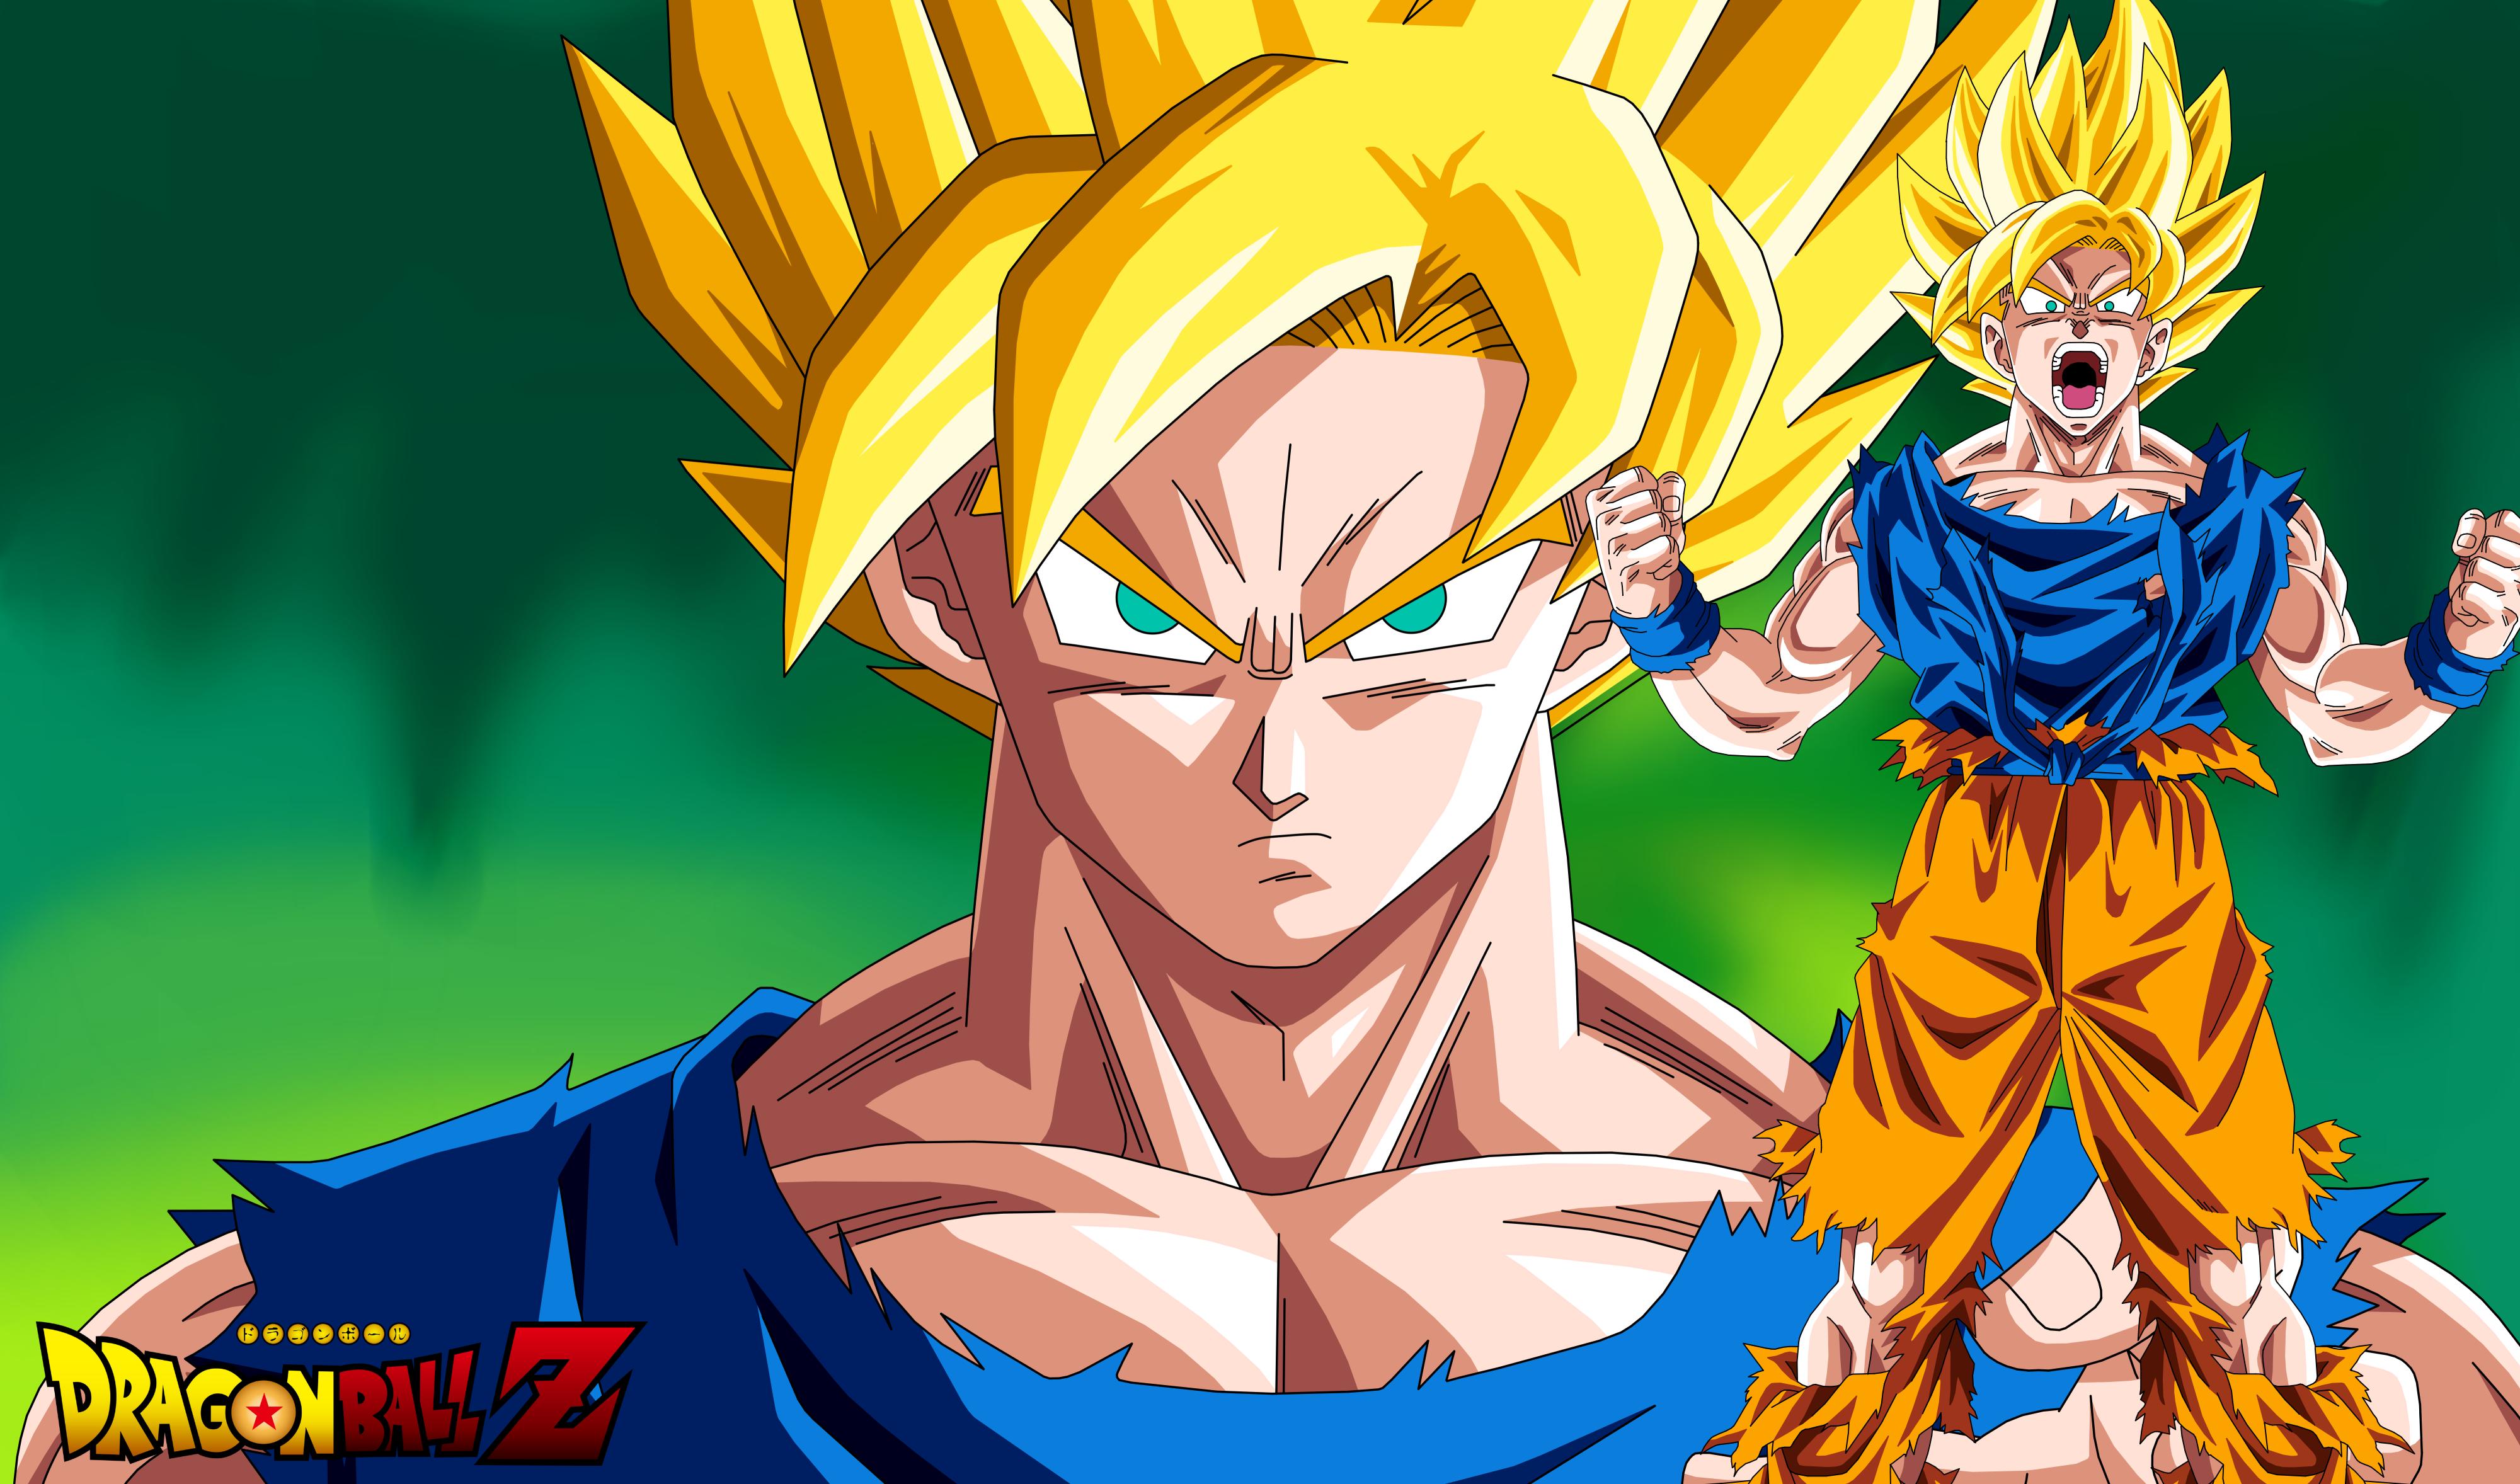 Wallpaper Goku Super Saiyan